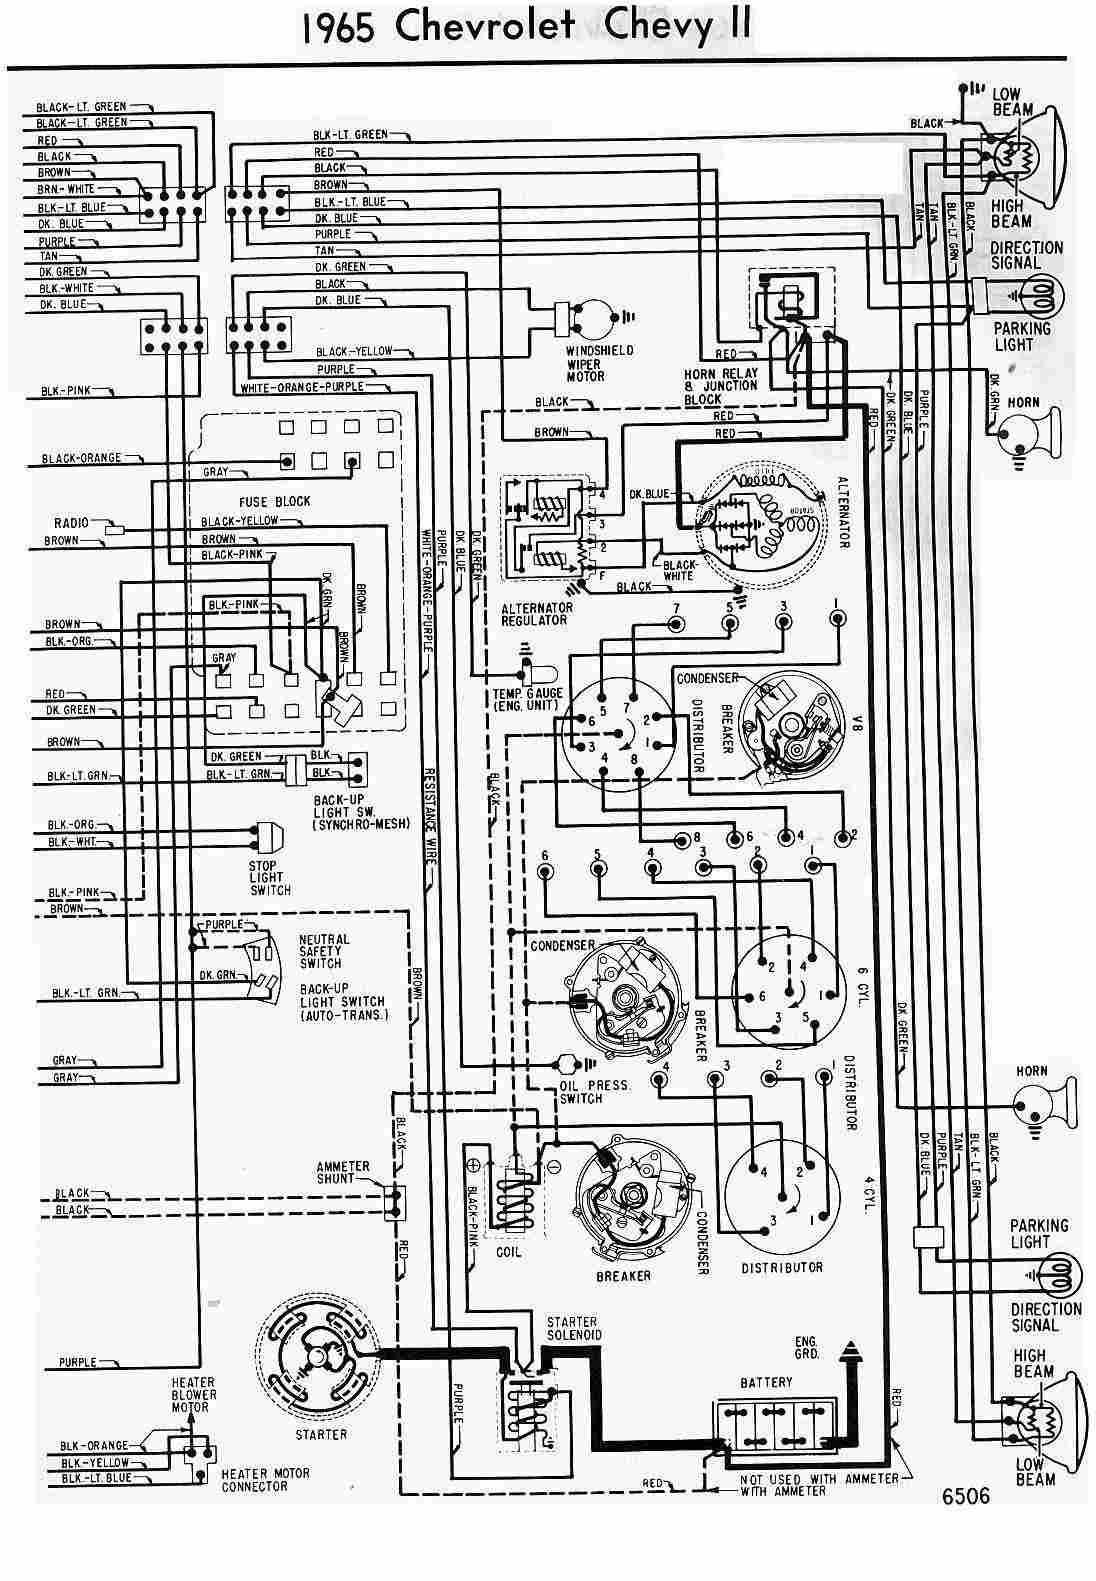 Pretty Ibanez Wiring Thin 5 Way Switch Flat Dimarzio Diagrams 3 Humbucker Strat Old Ibanez Btb 406 WhiteSecurity Wires 1965 Chevy Truck Wiring Diagram   Dolgular